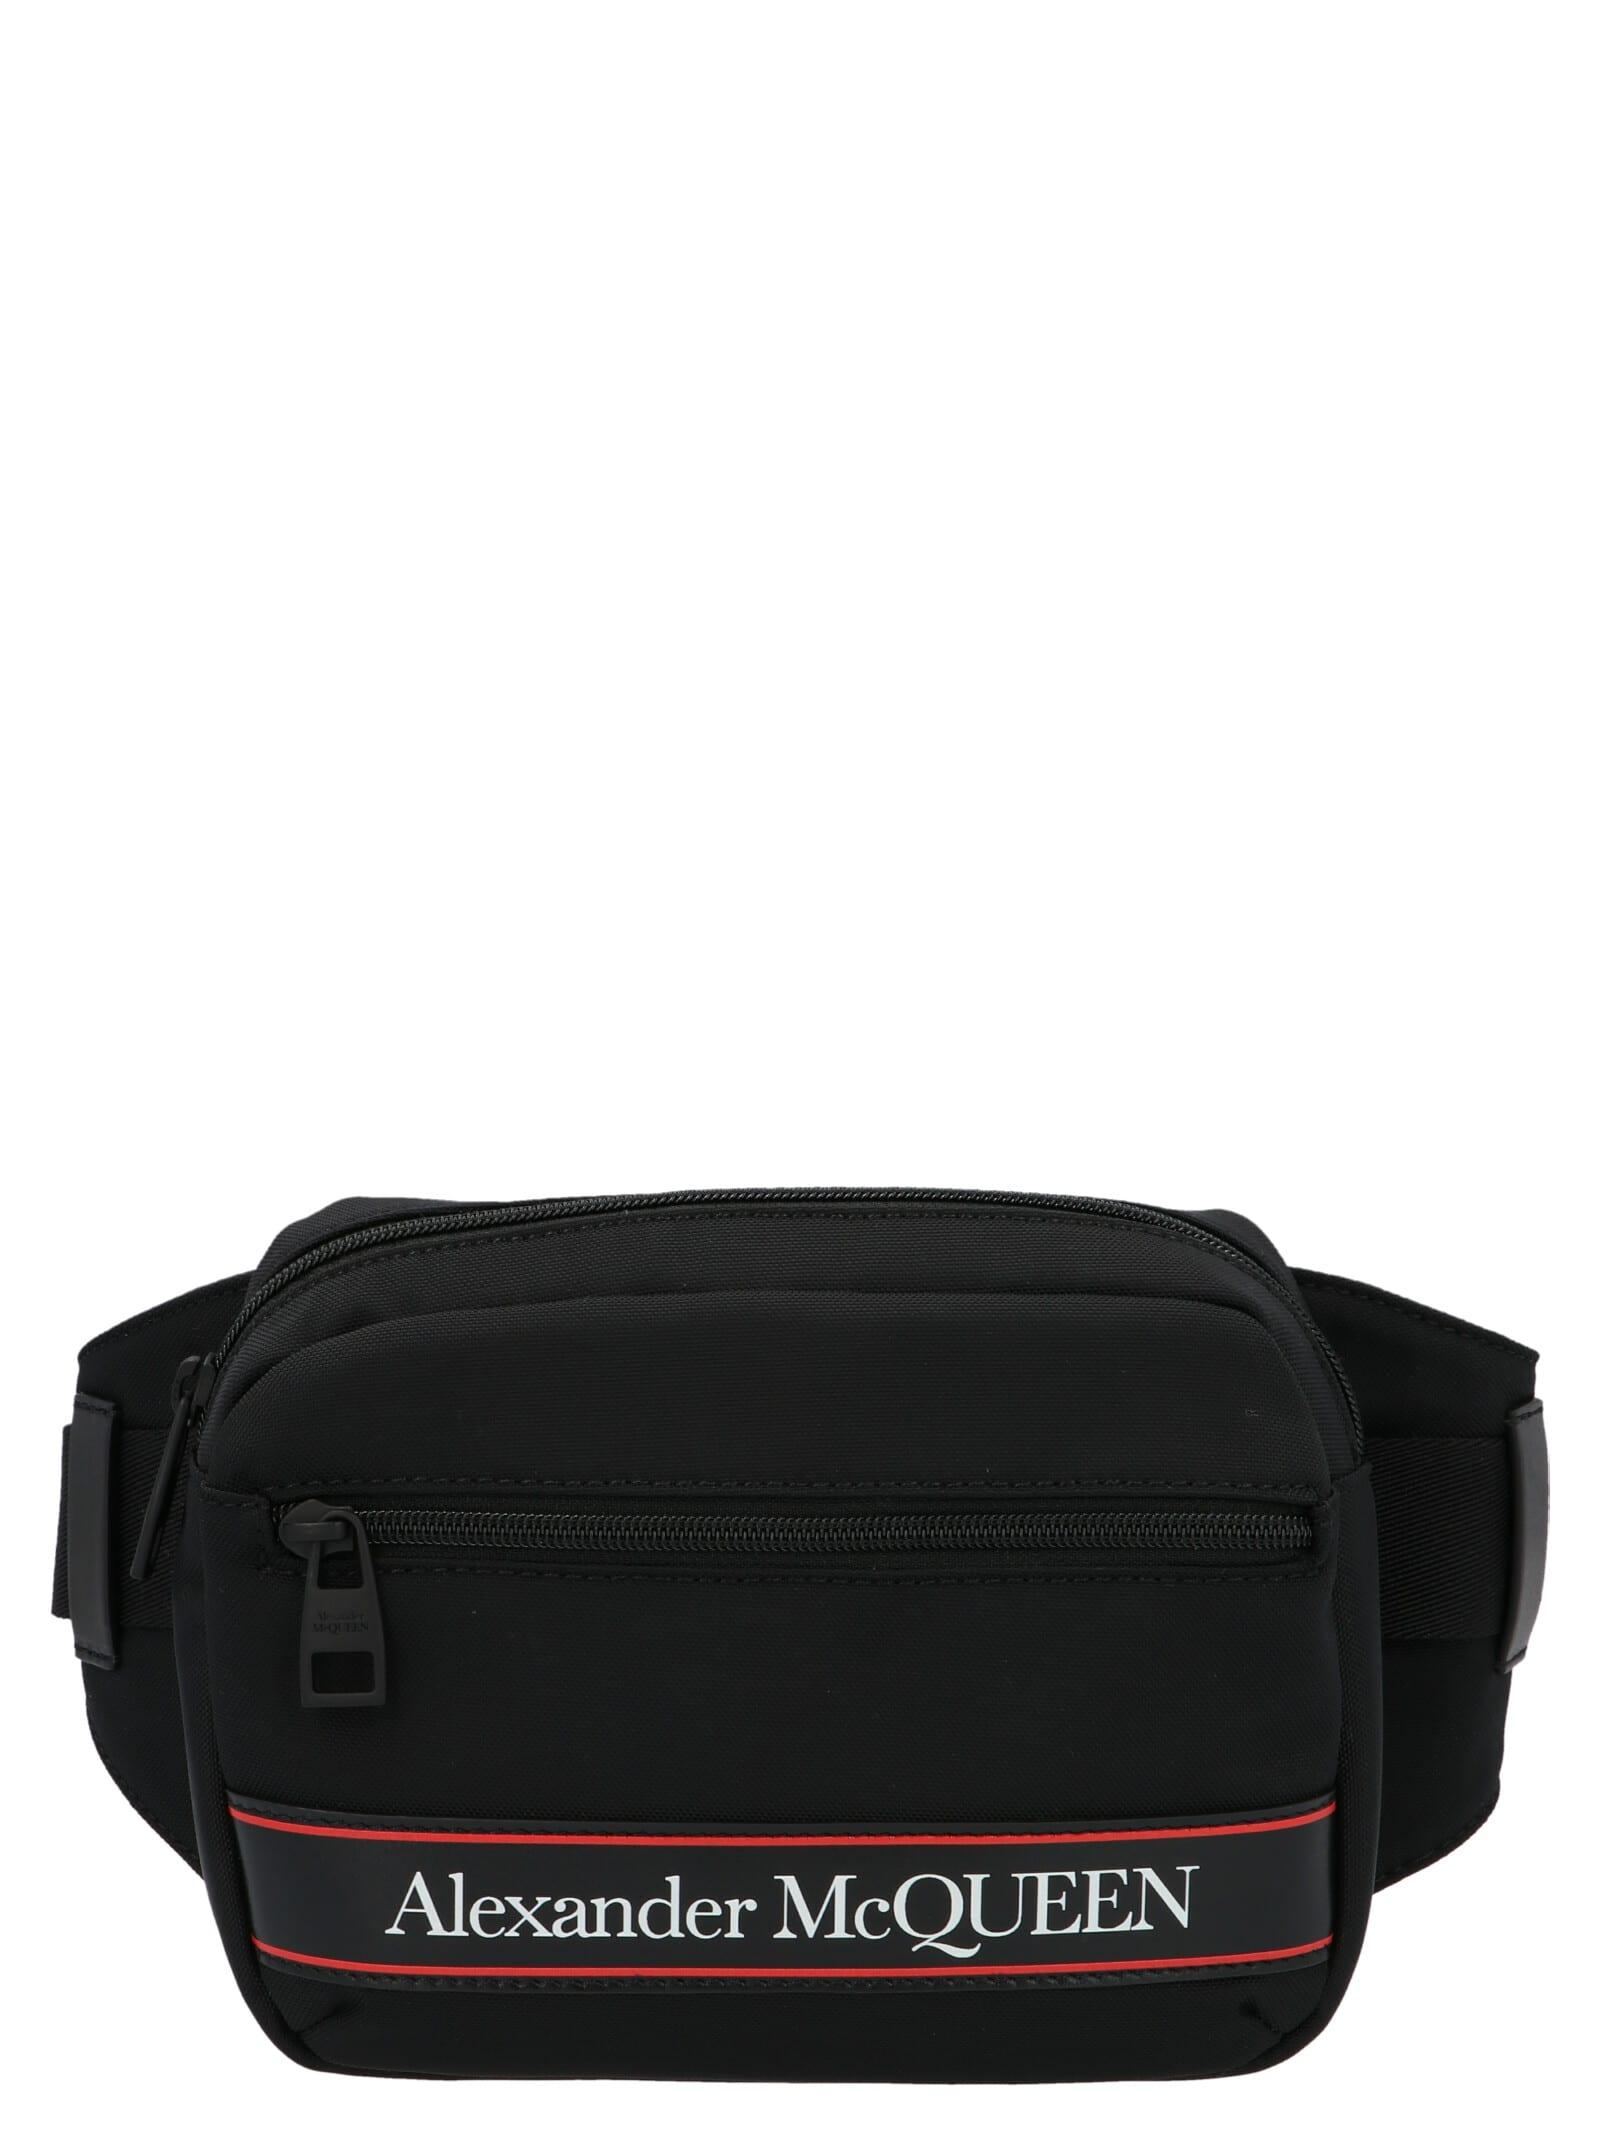 Alexander Mcqueen urban Bum Bag Bag